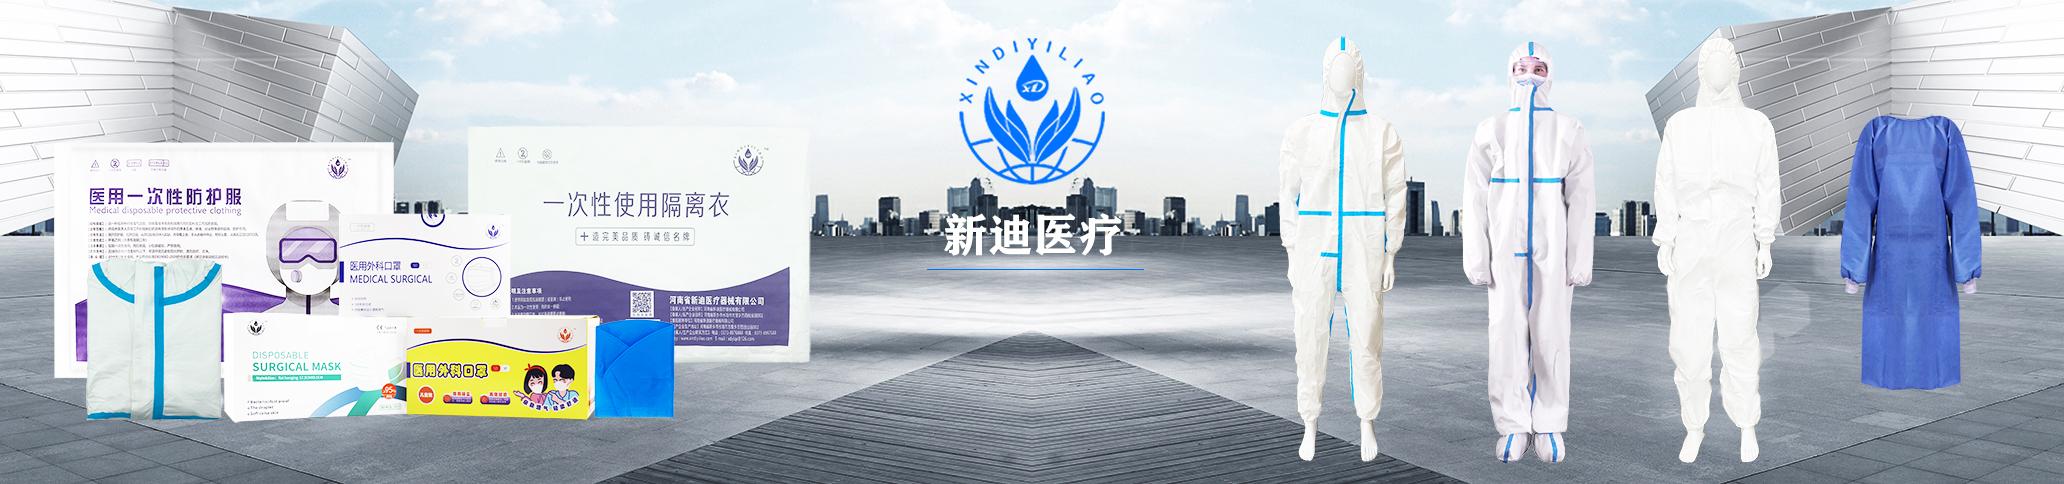 http://www.xindiyiliao.com/data/upload/202108/20210823113837_714.jpg